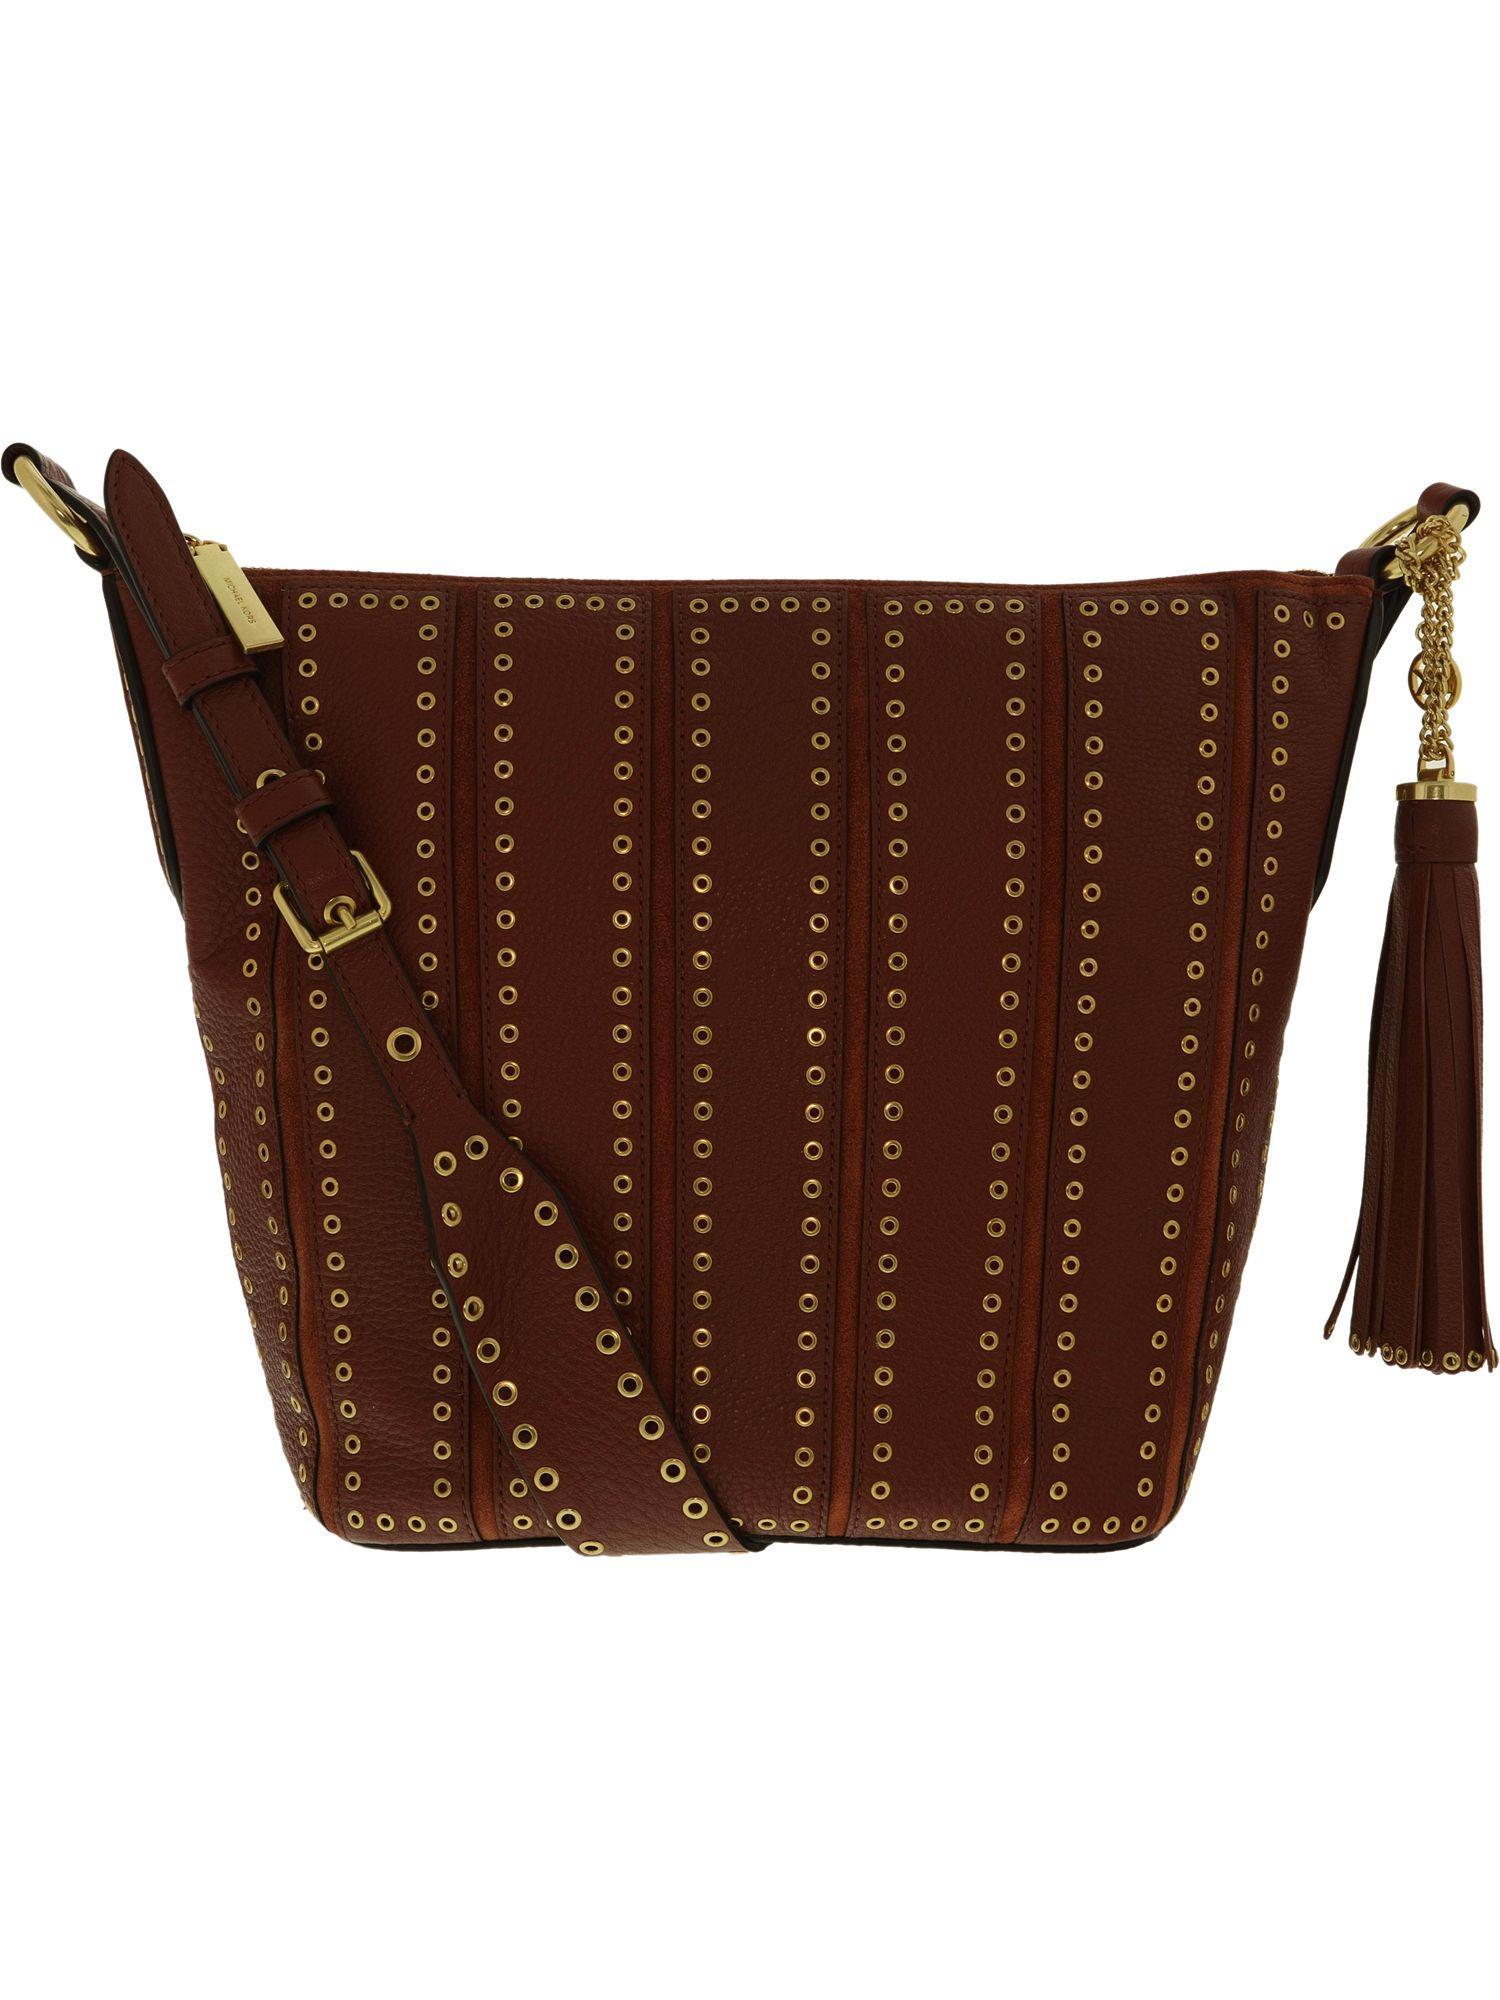 682f3e7ea008 Michael Kors. Orange Women's Medium Brooklyn Grommet Leather Feed Bag ...